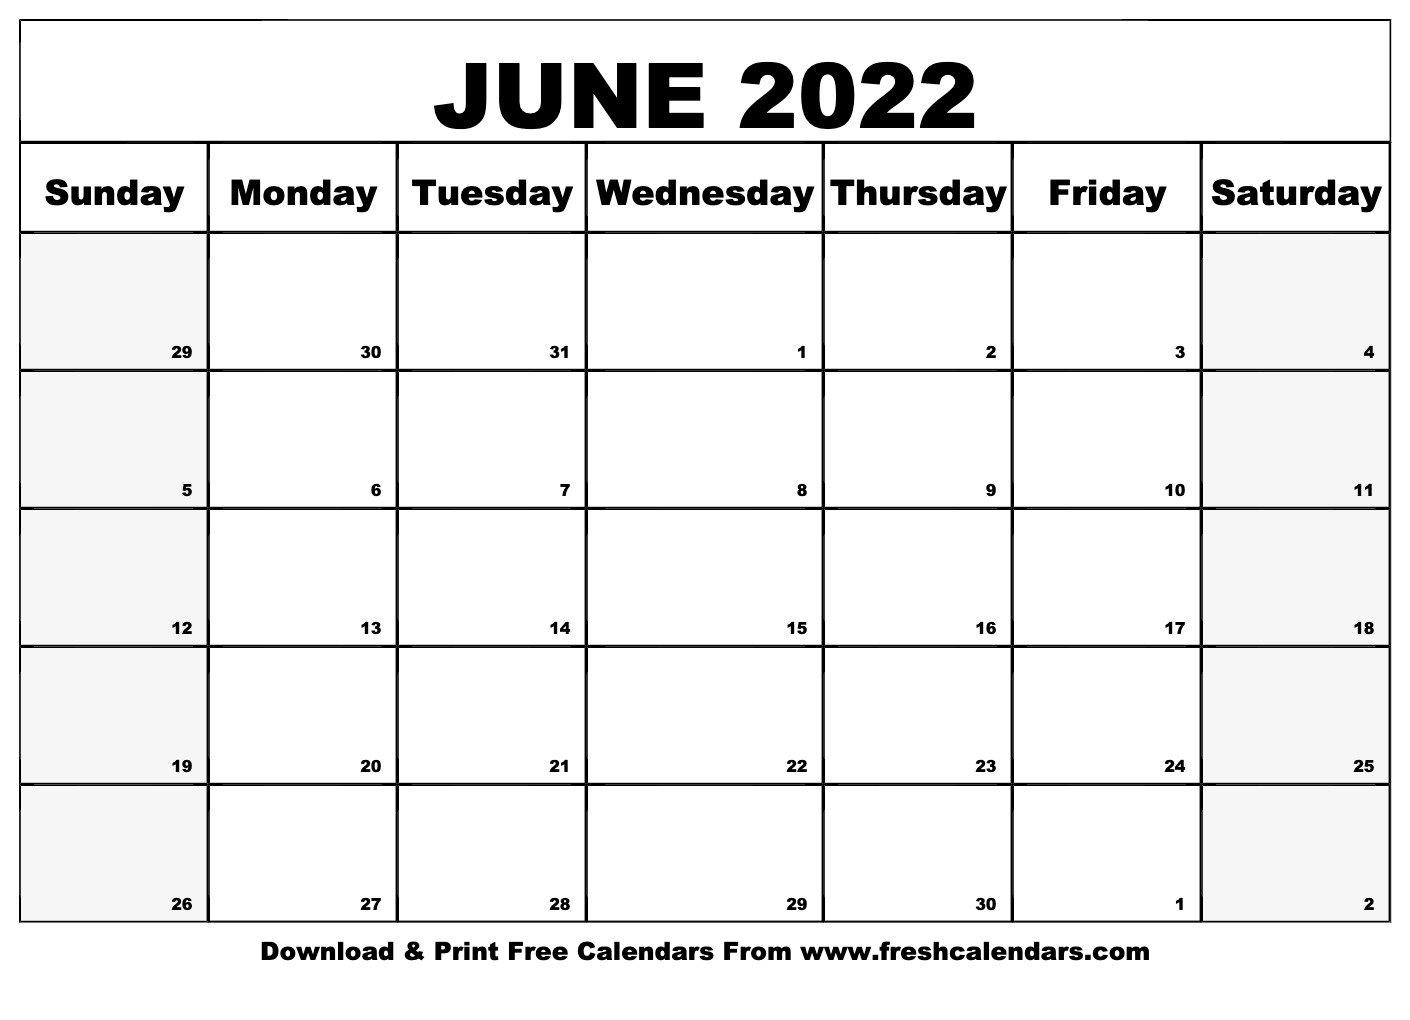 Blank Printable June 2022 Calendars regarding Monthly Calendar September 2022